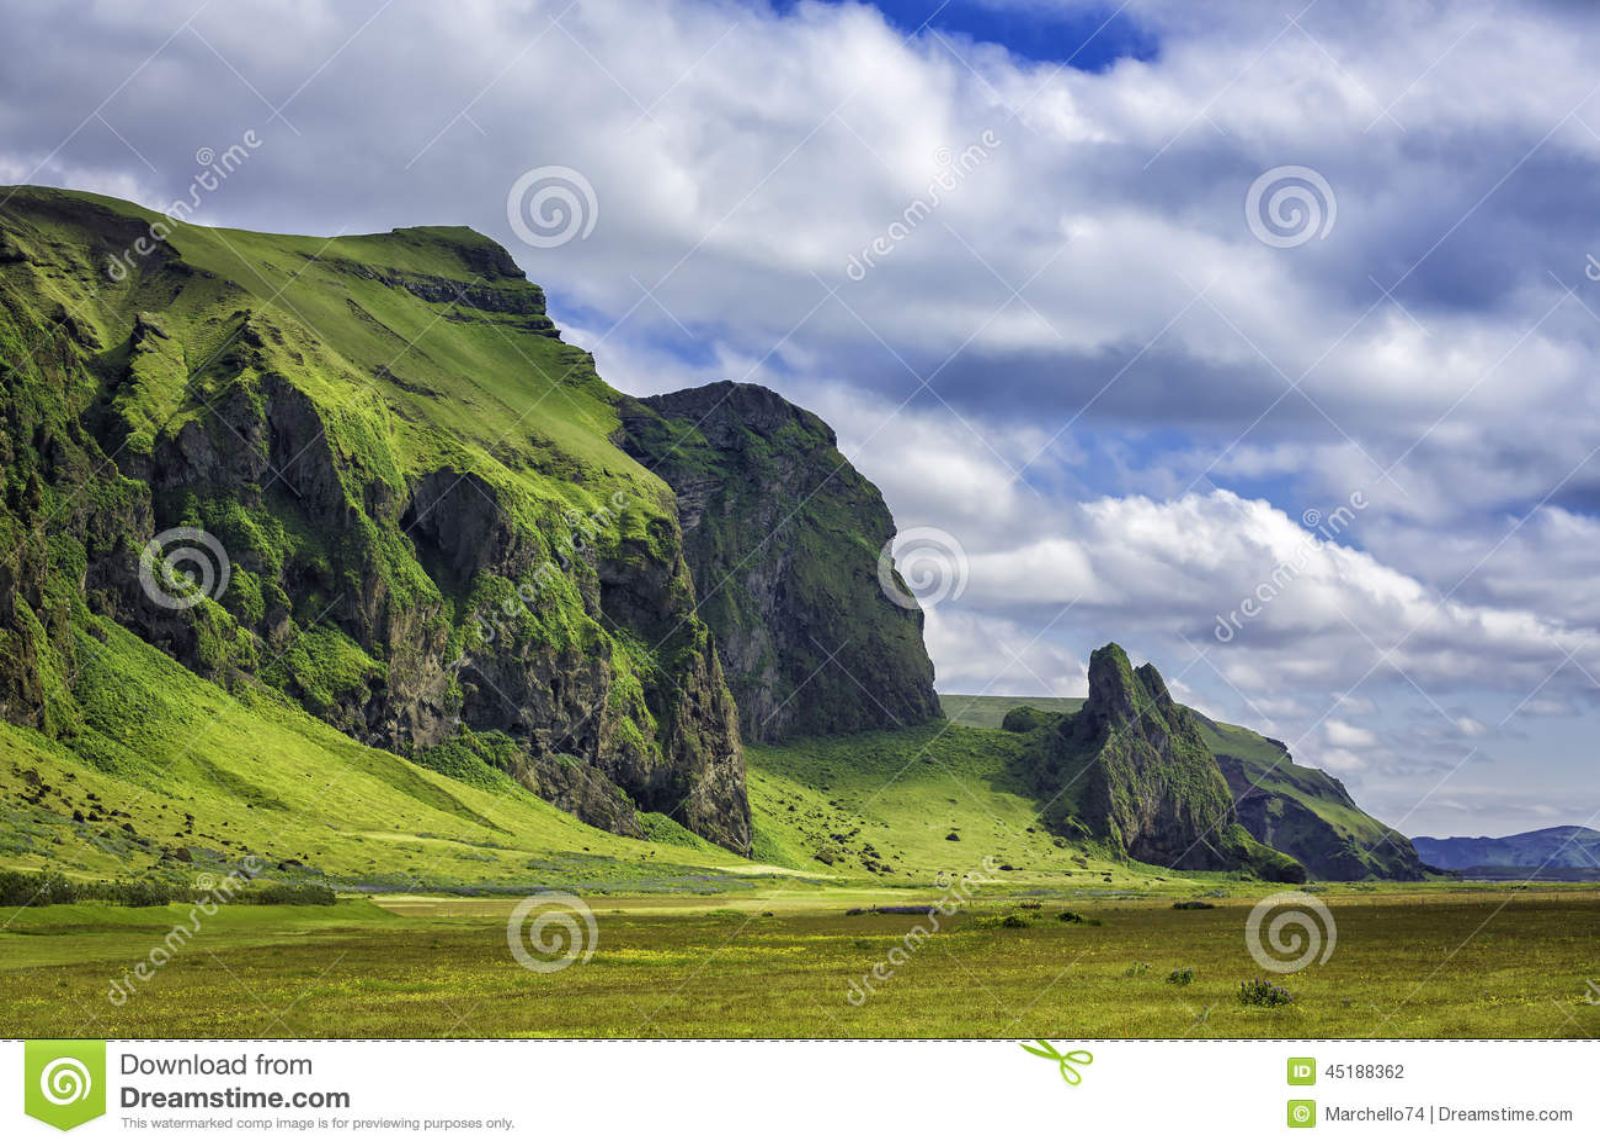 Icelandic mountain landscapes